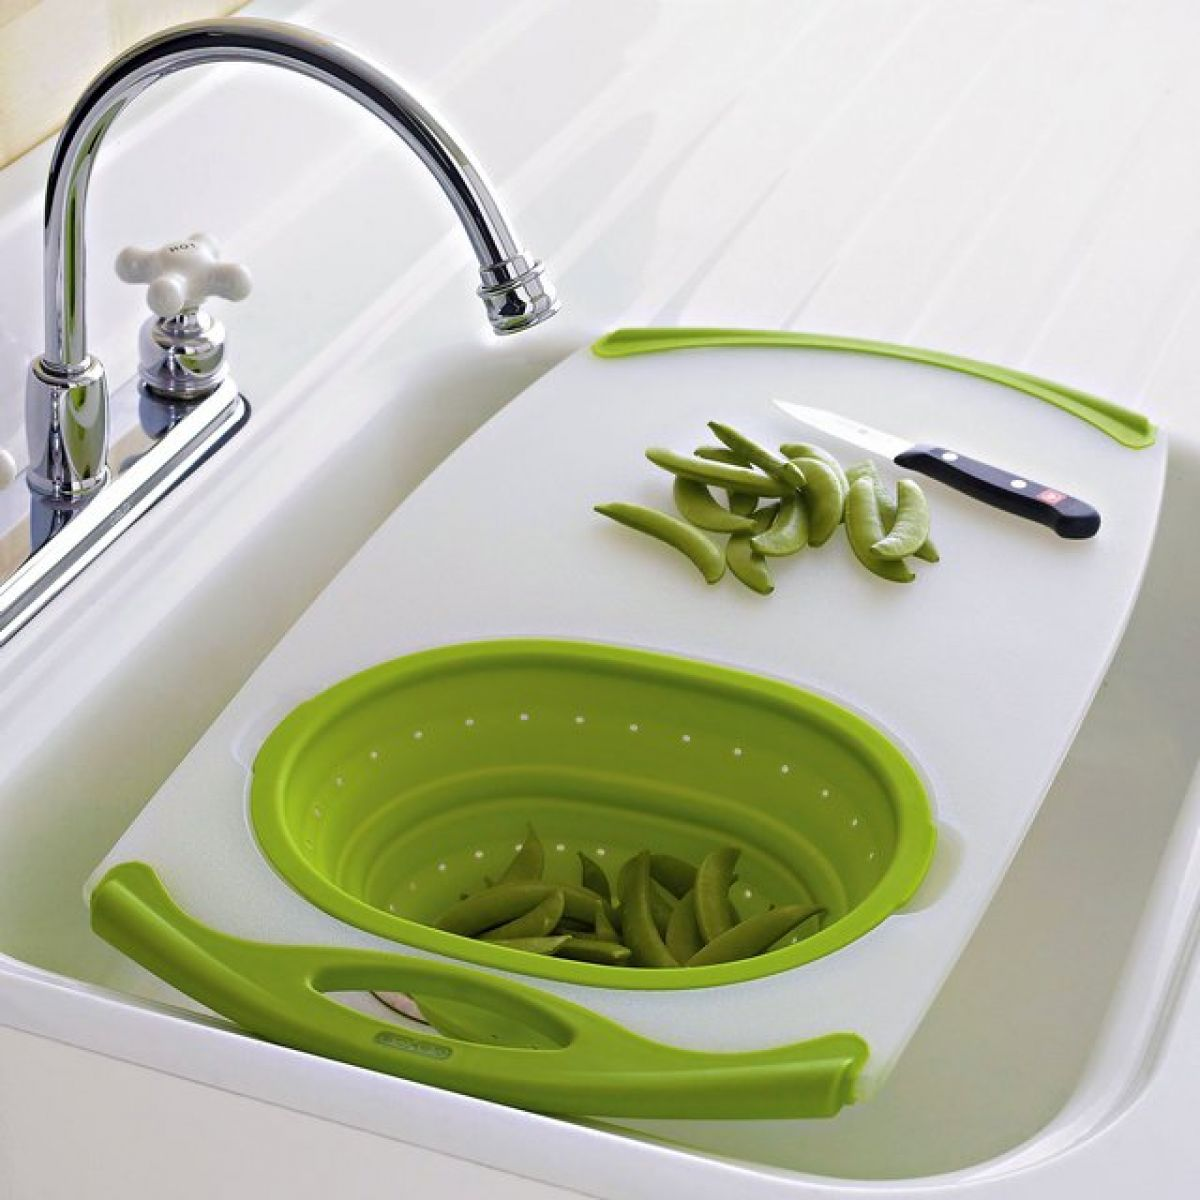 40 Innovadores utensilios de cocina (Parte 2) ~ 8 OCHOA DESIGN ...